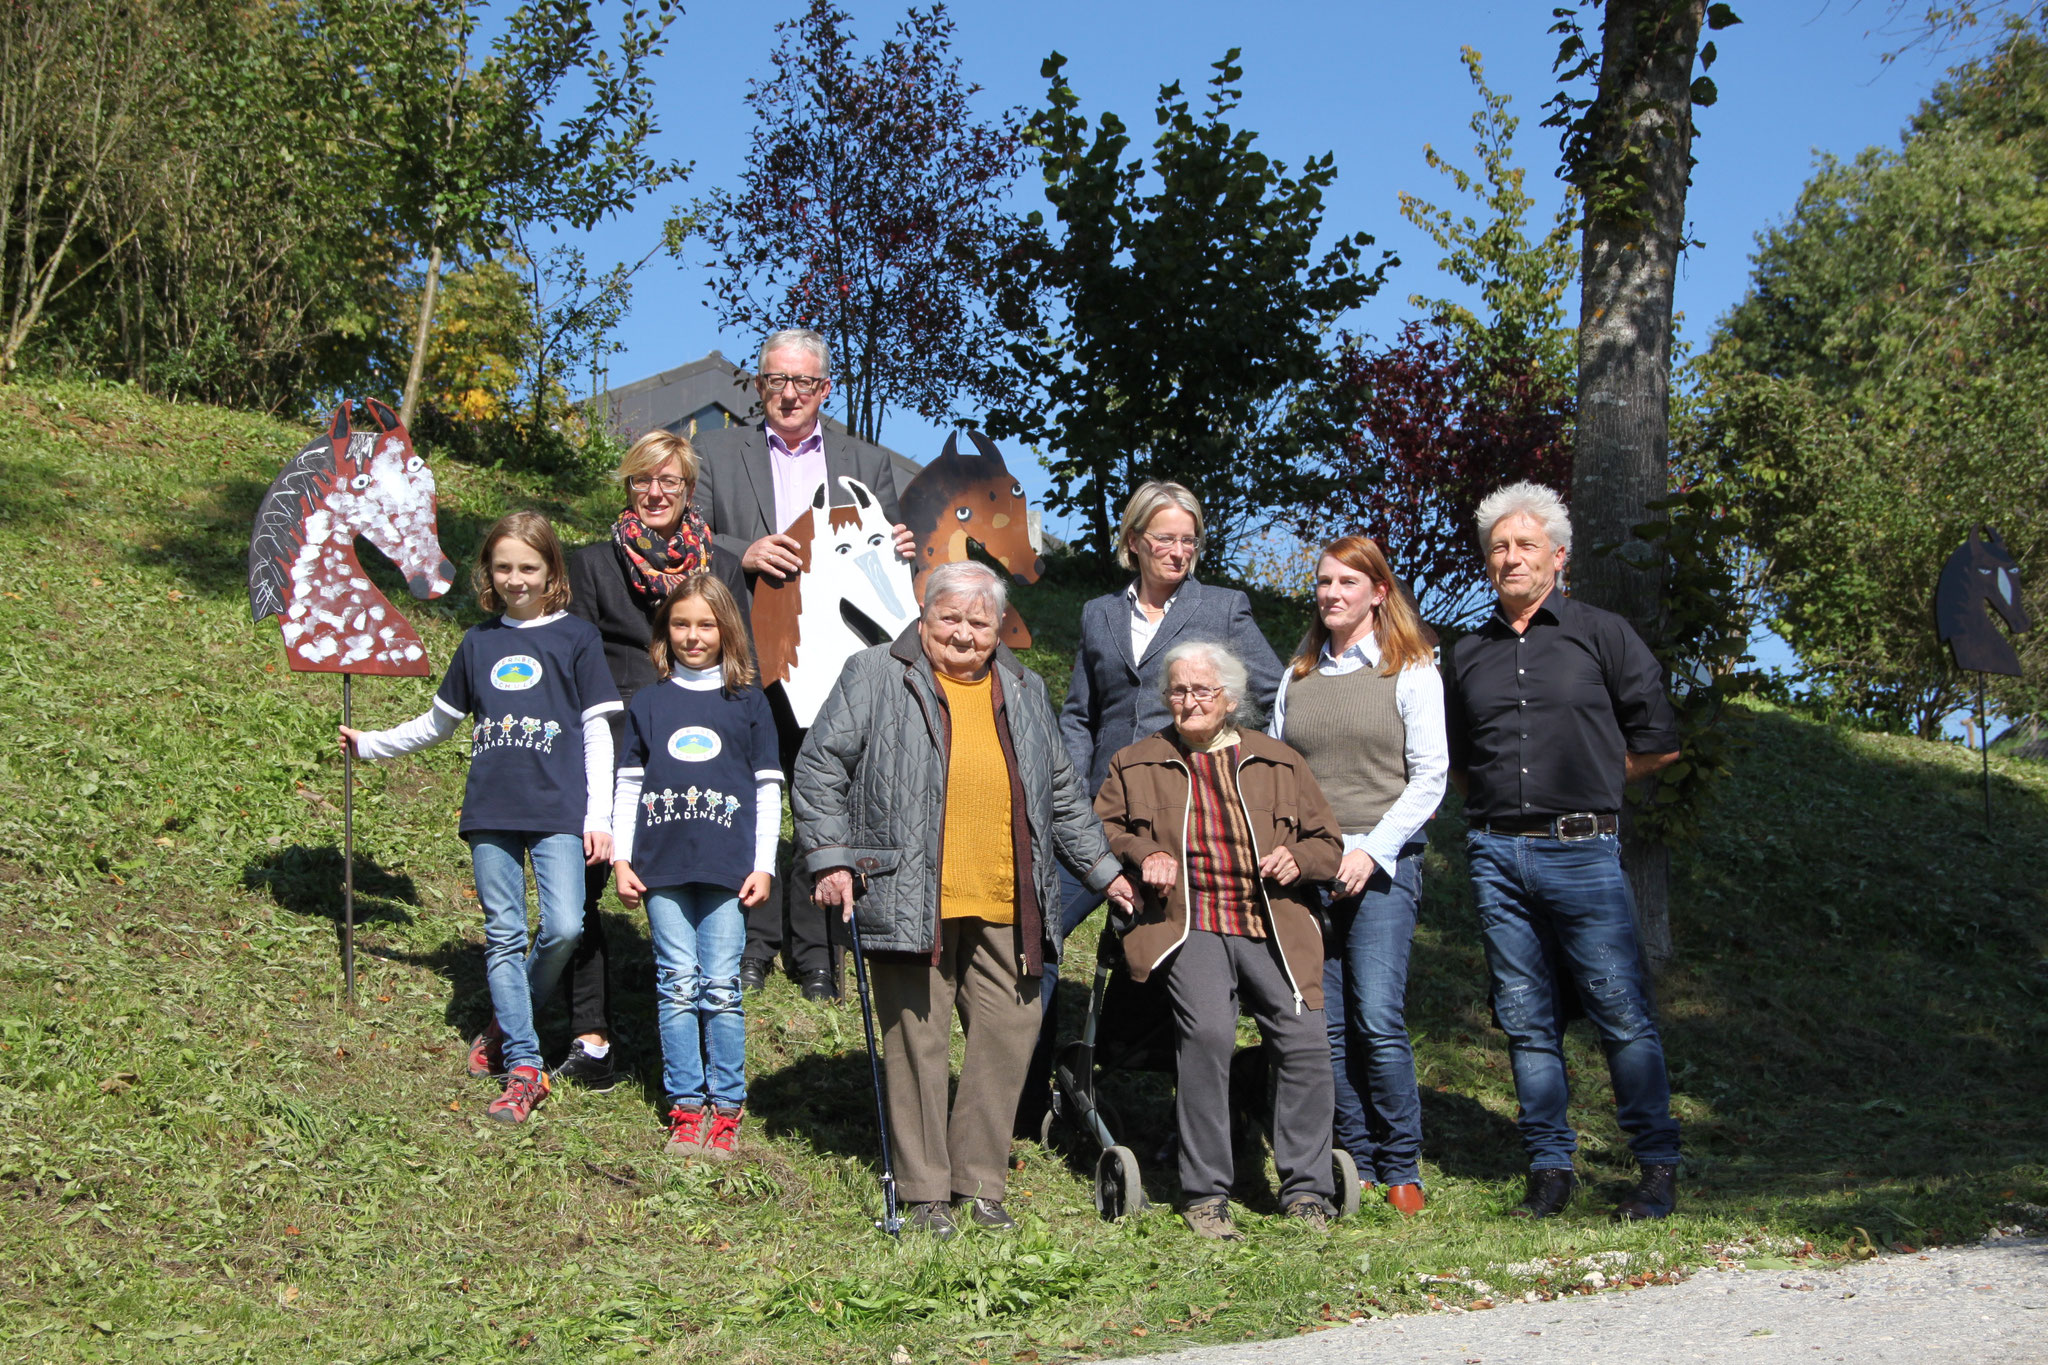 Mit den fertigen Rössern am Gestüt Marbach